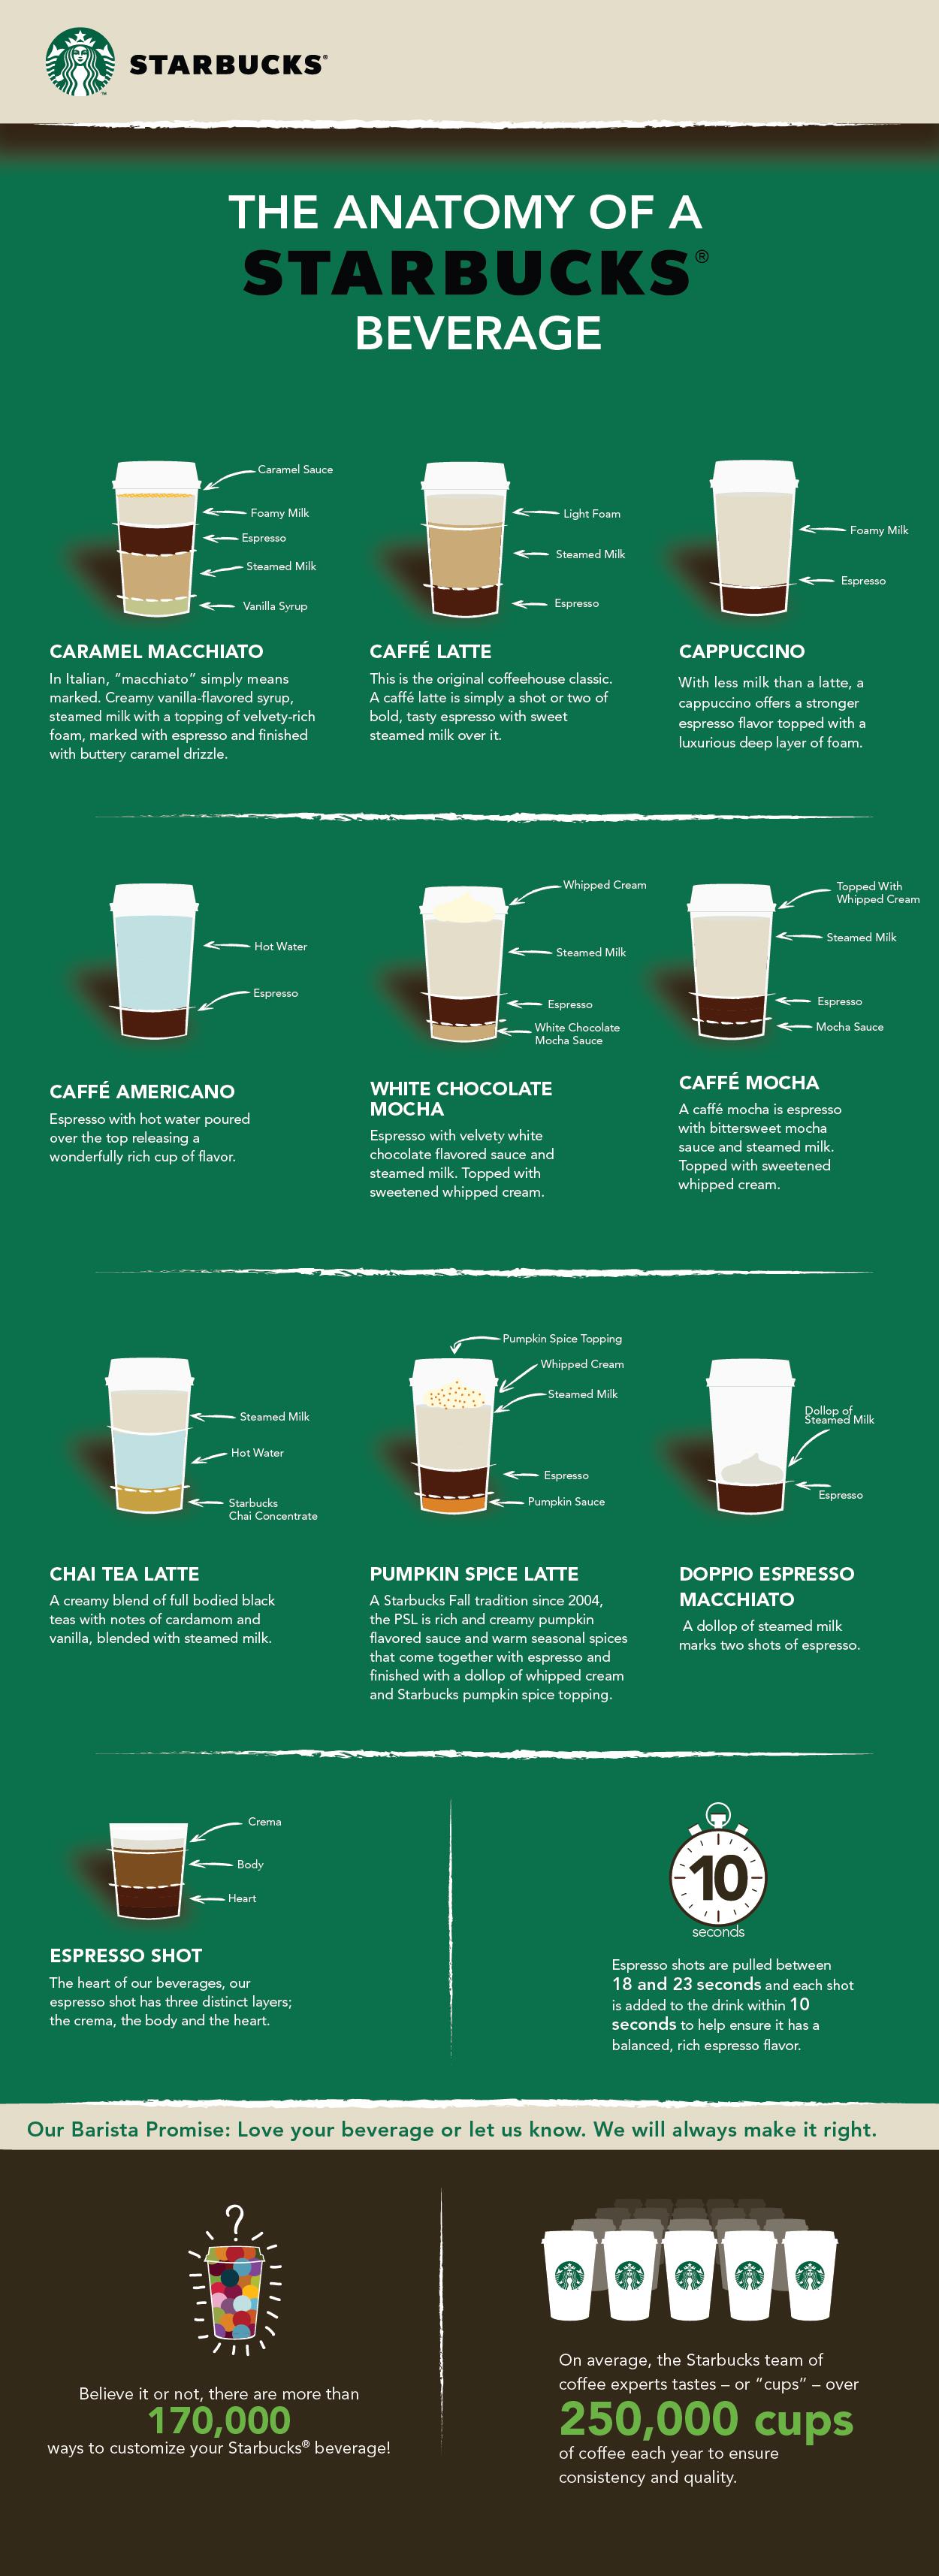 The Anatomy of a Starbucks Beverage